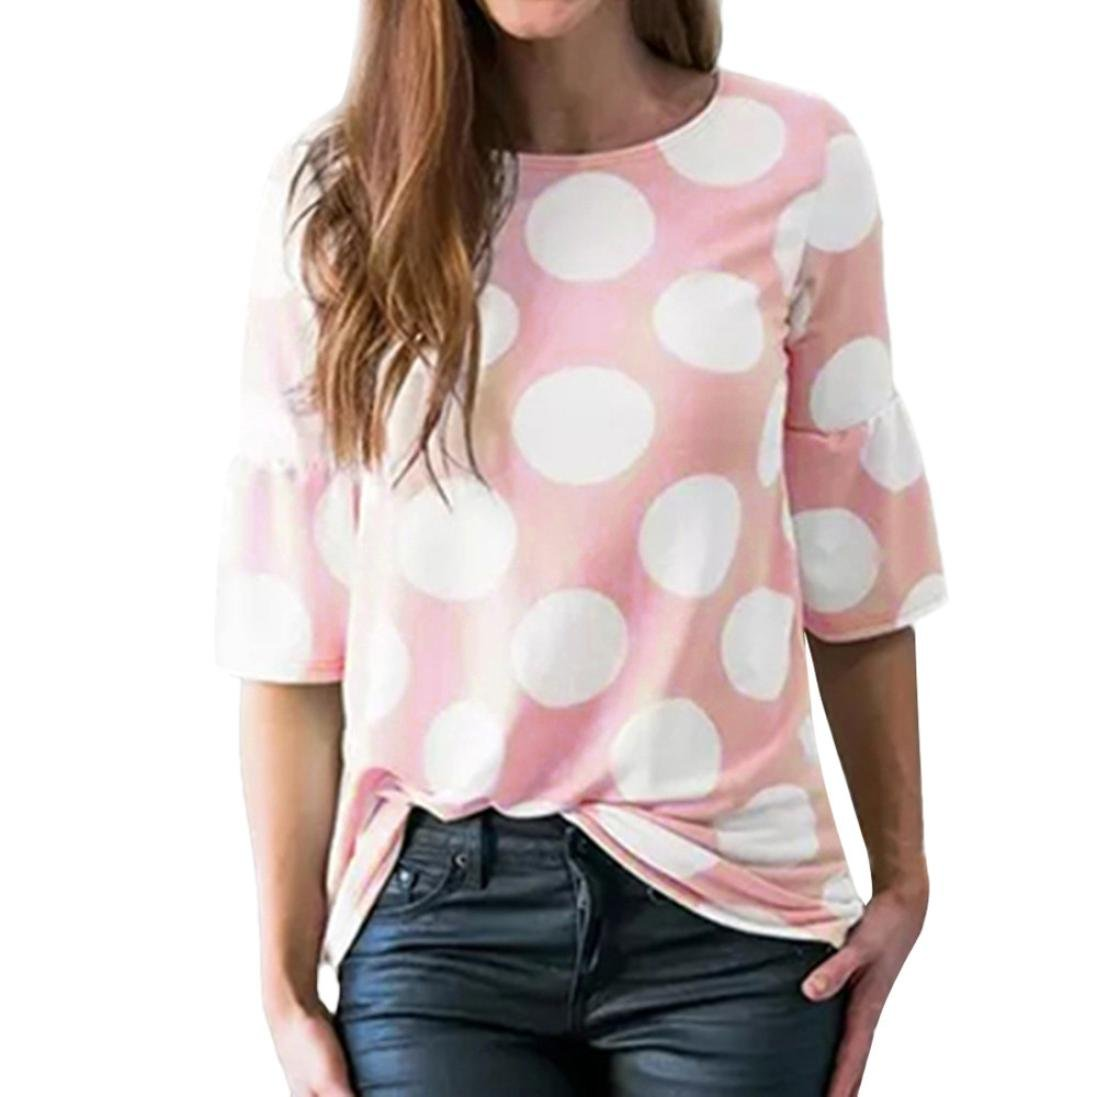 Damen Kurzarmshirt Freizeit Tunika Oberteil Bluse Hemd Longtop T-shirt Übergröße